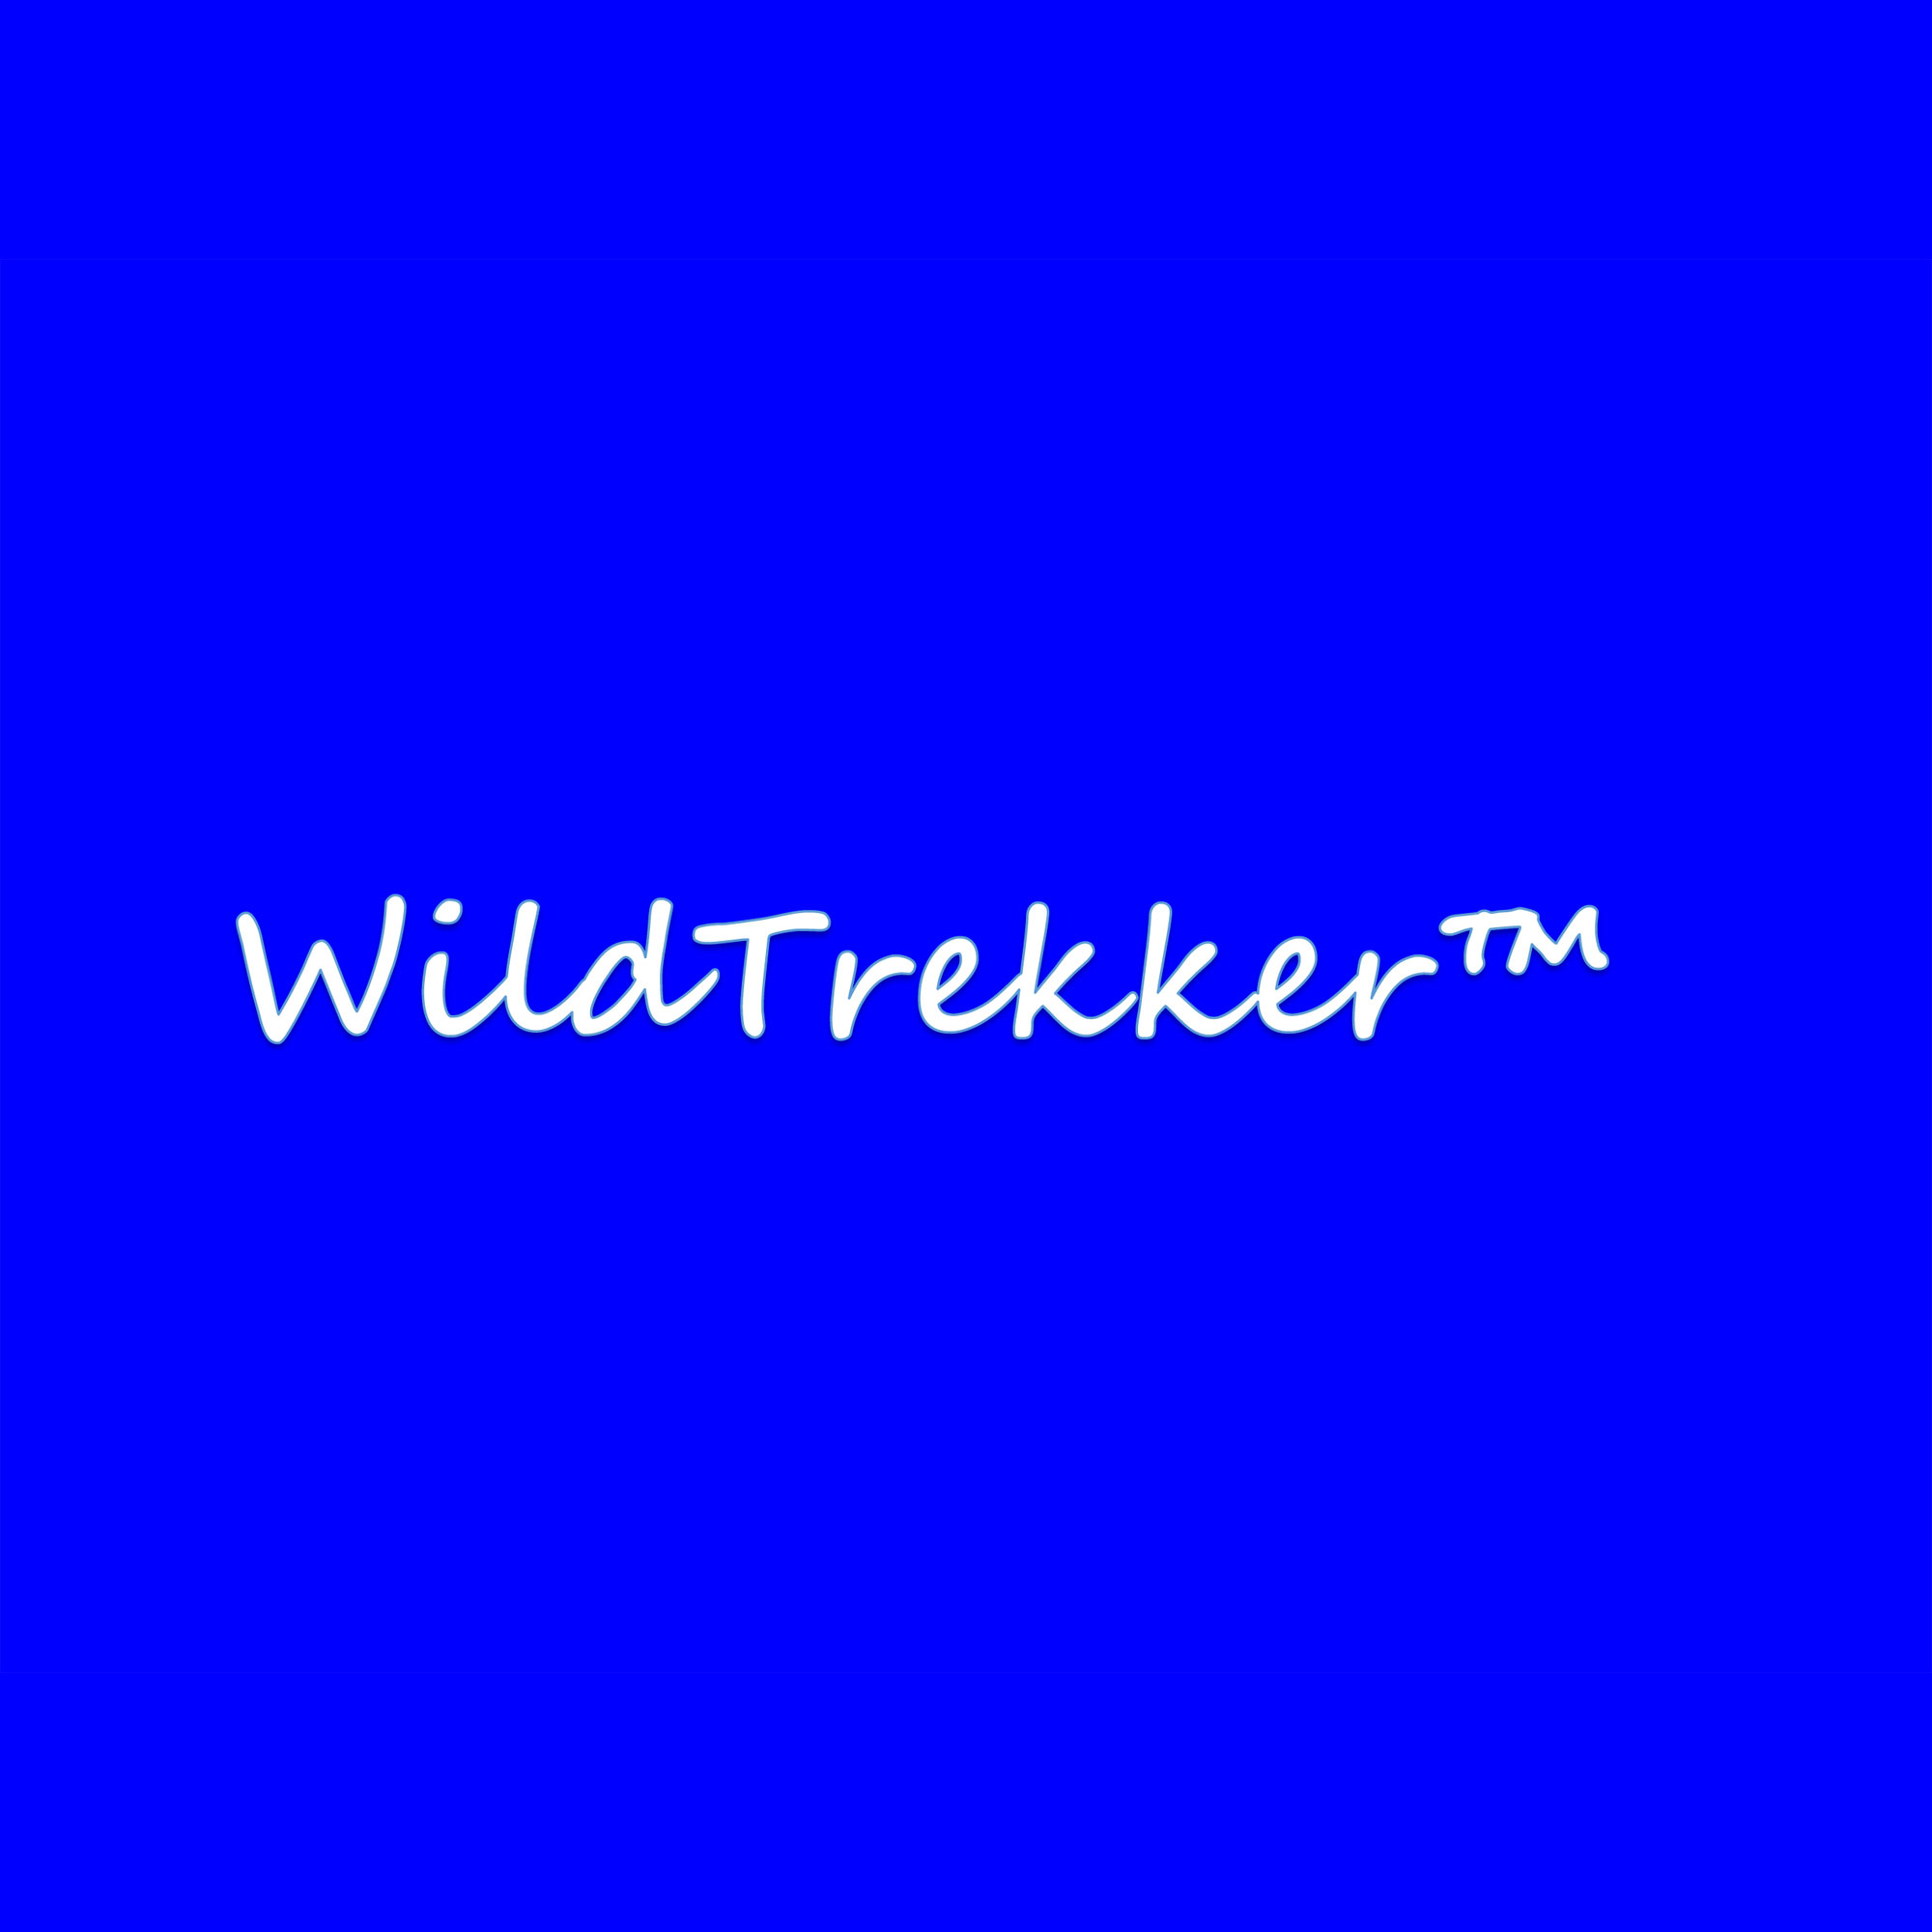 WildTrekker